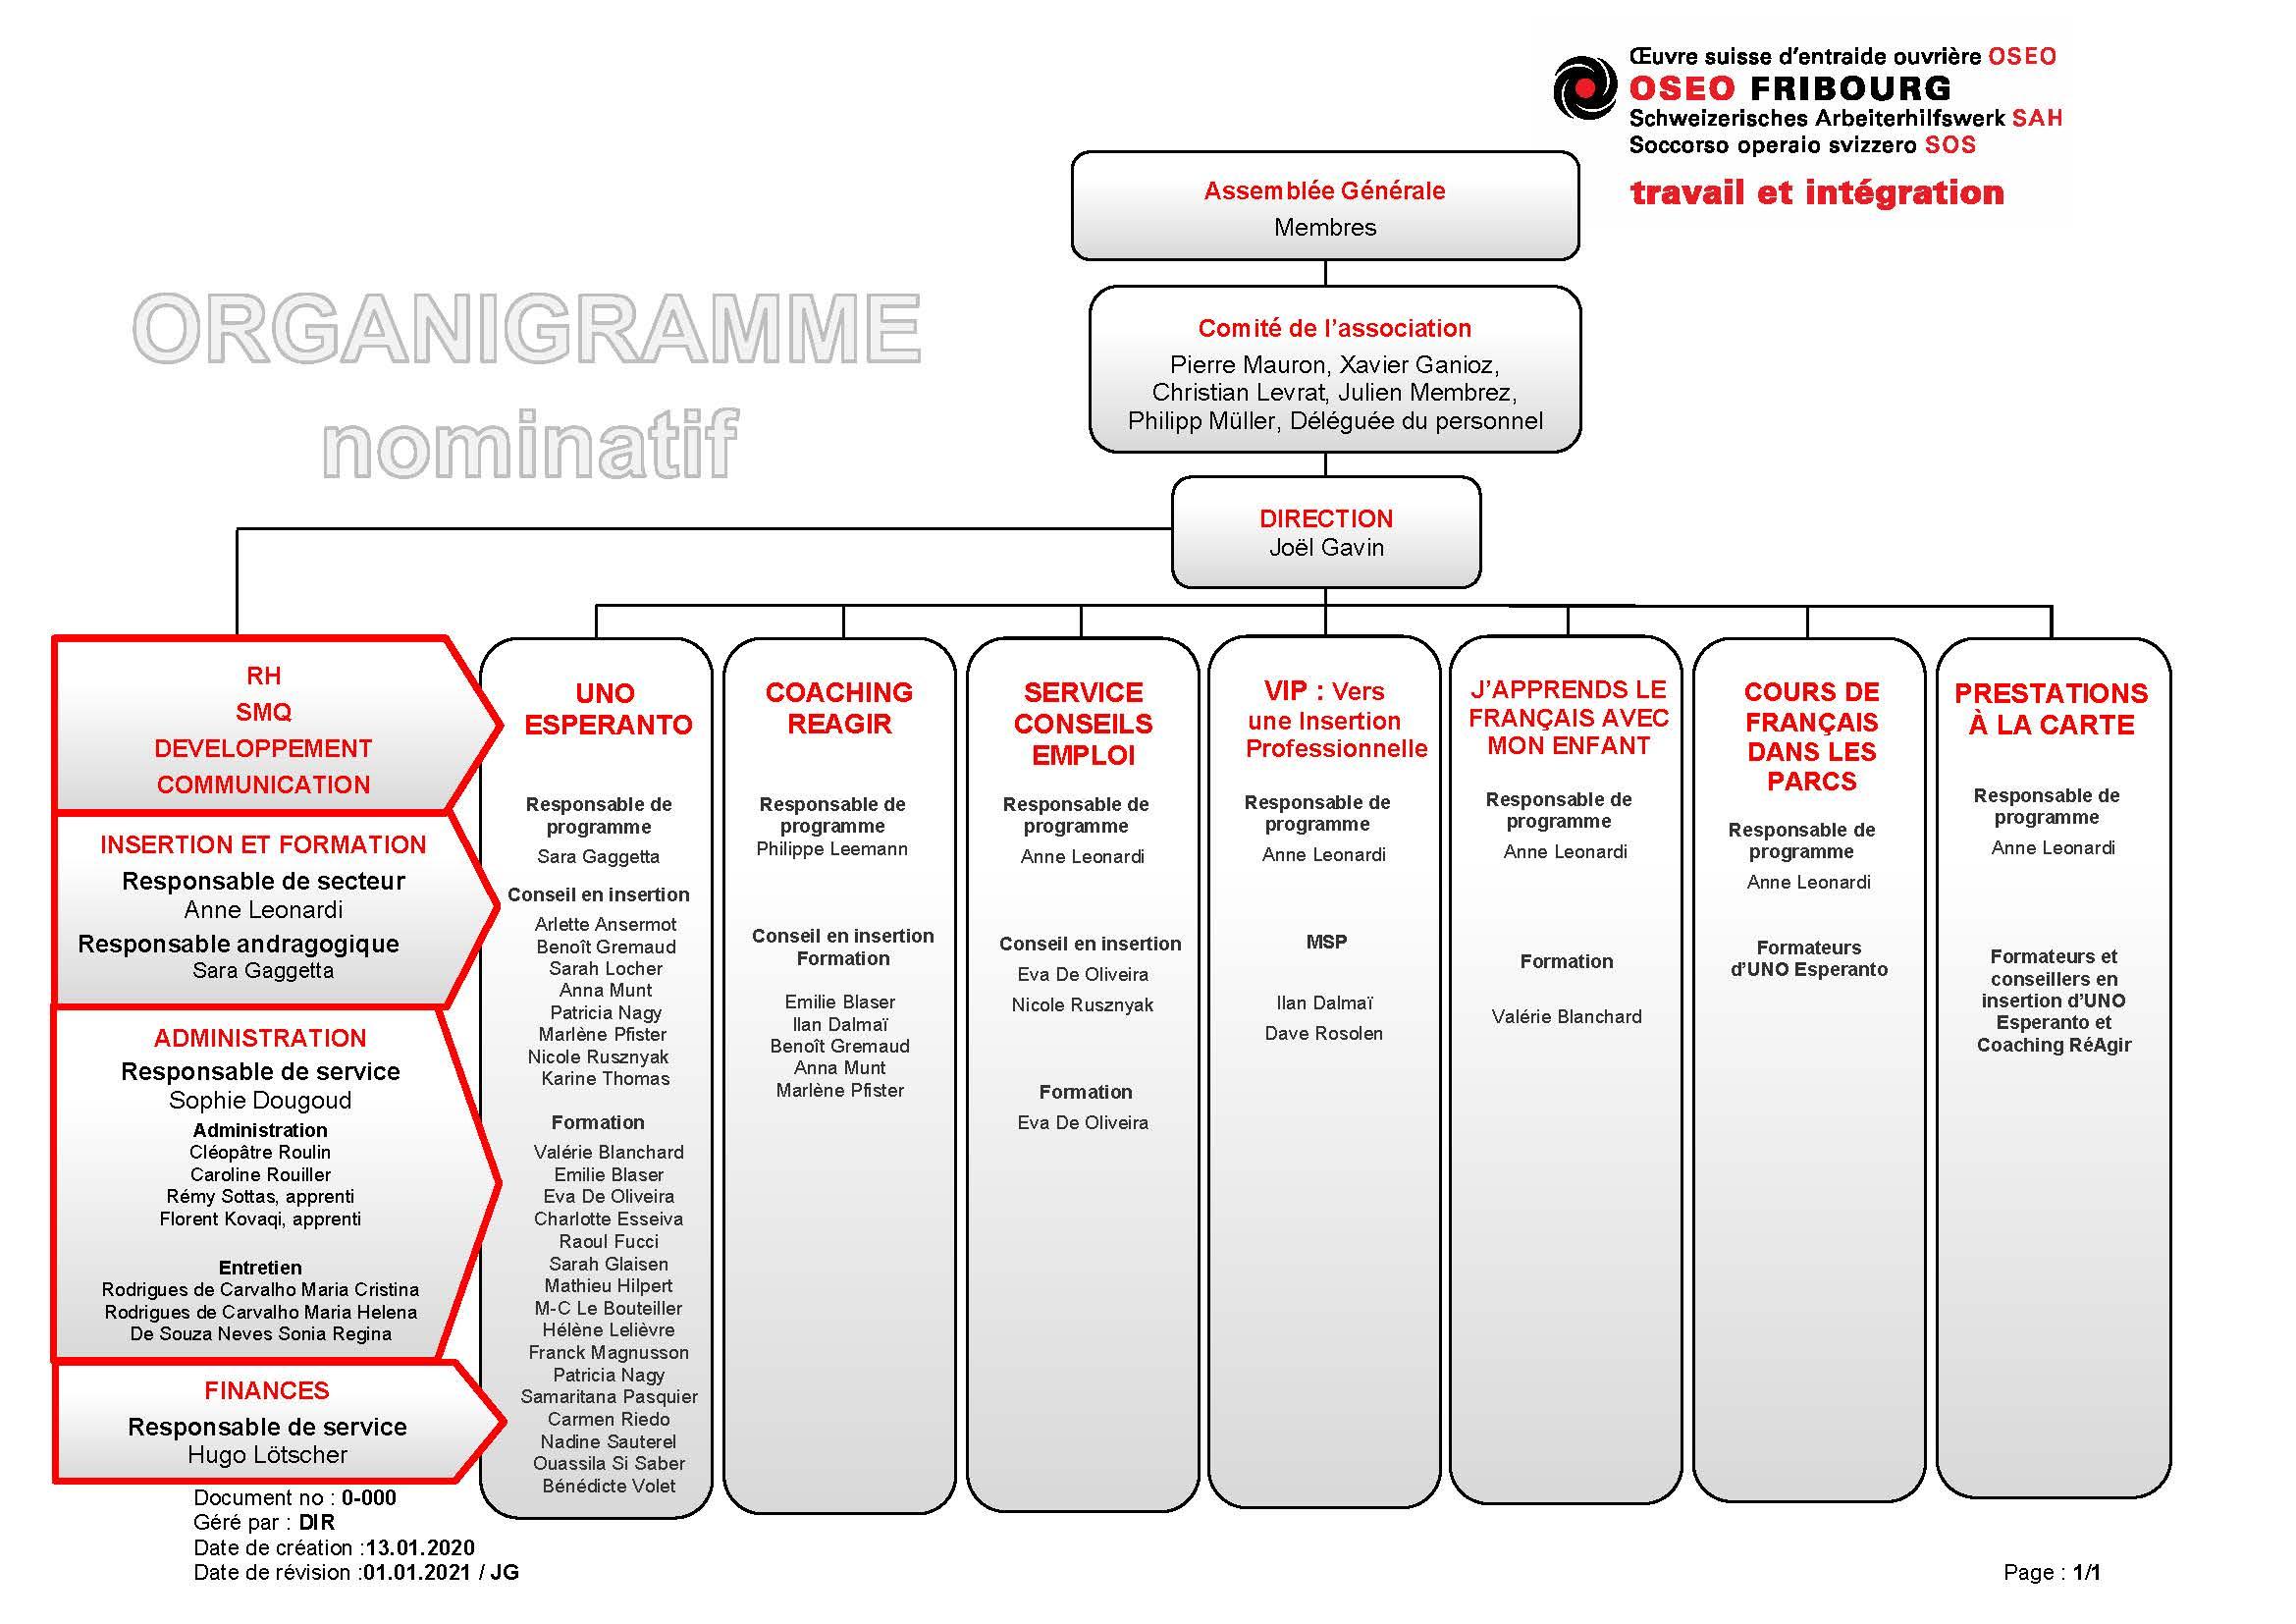 organigramme_nominatif2